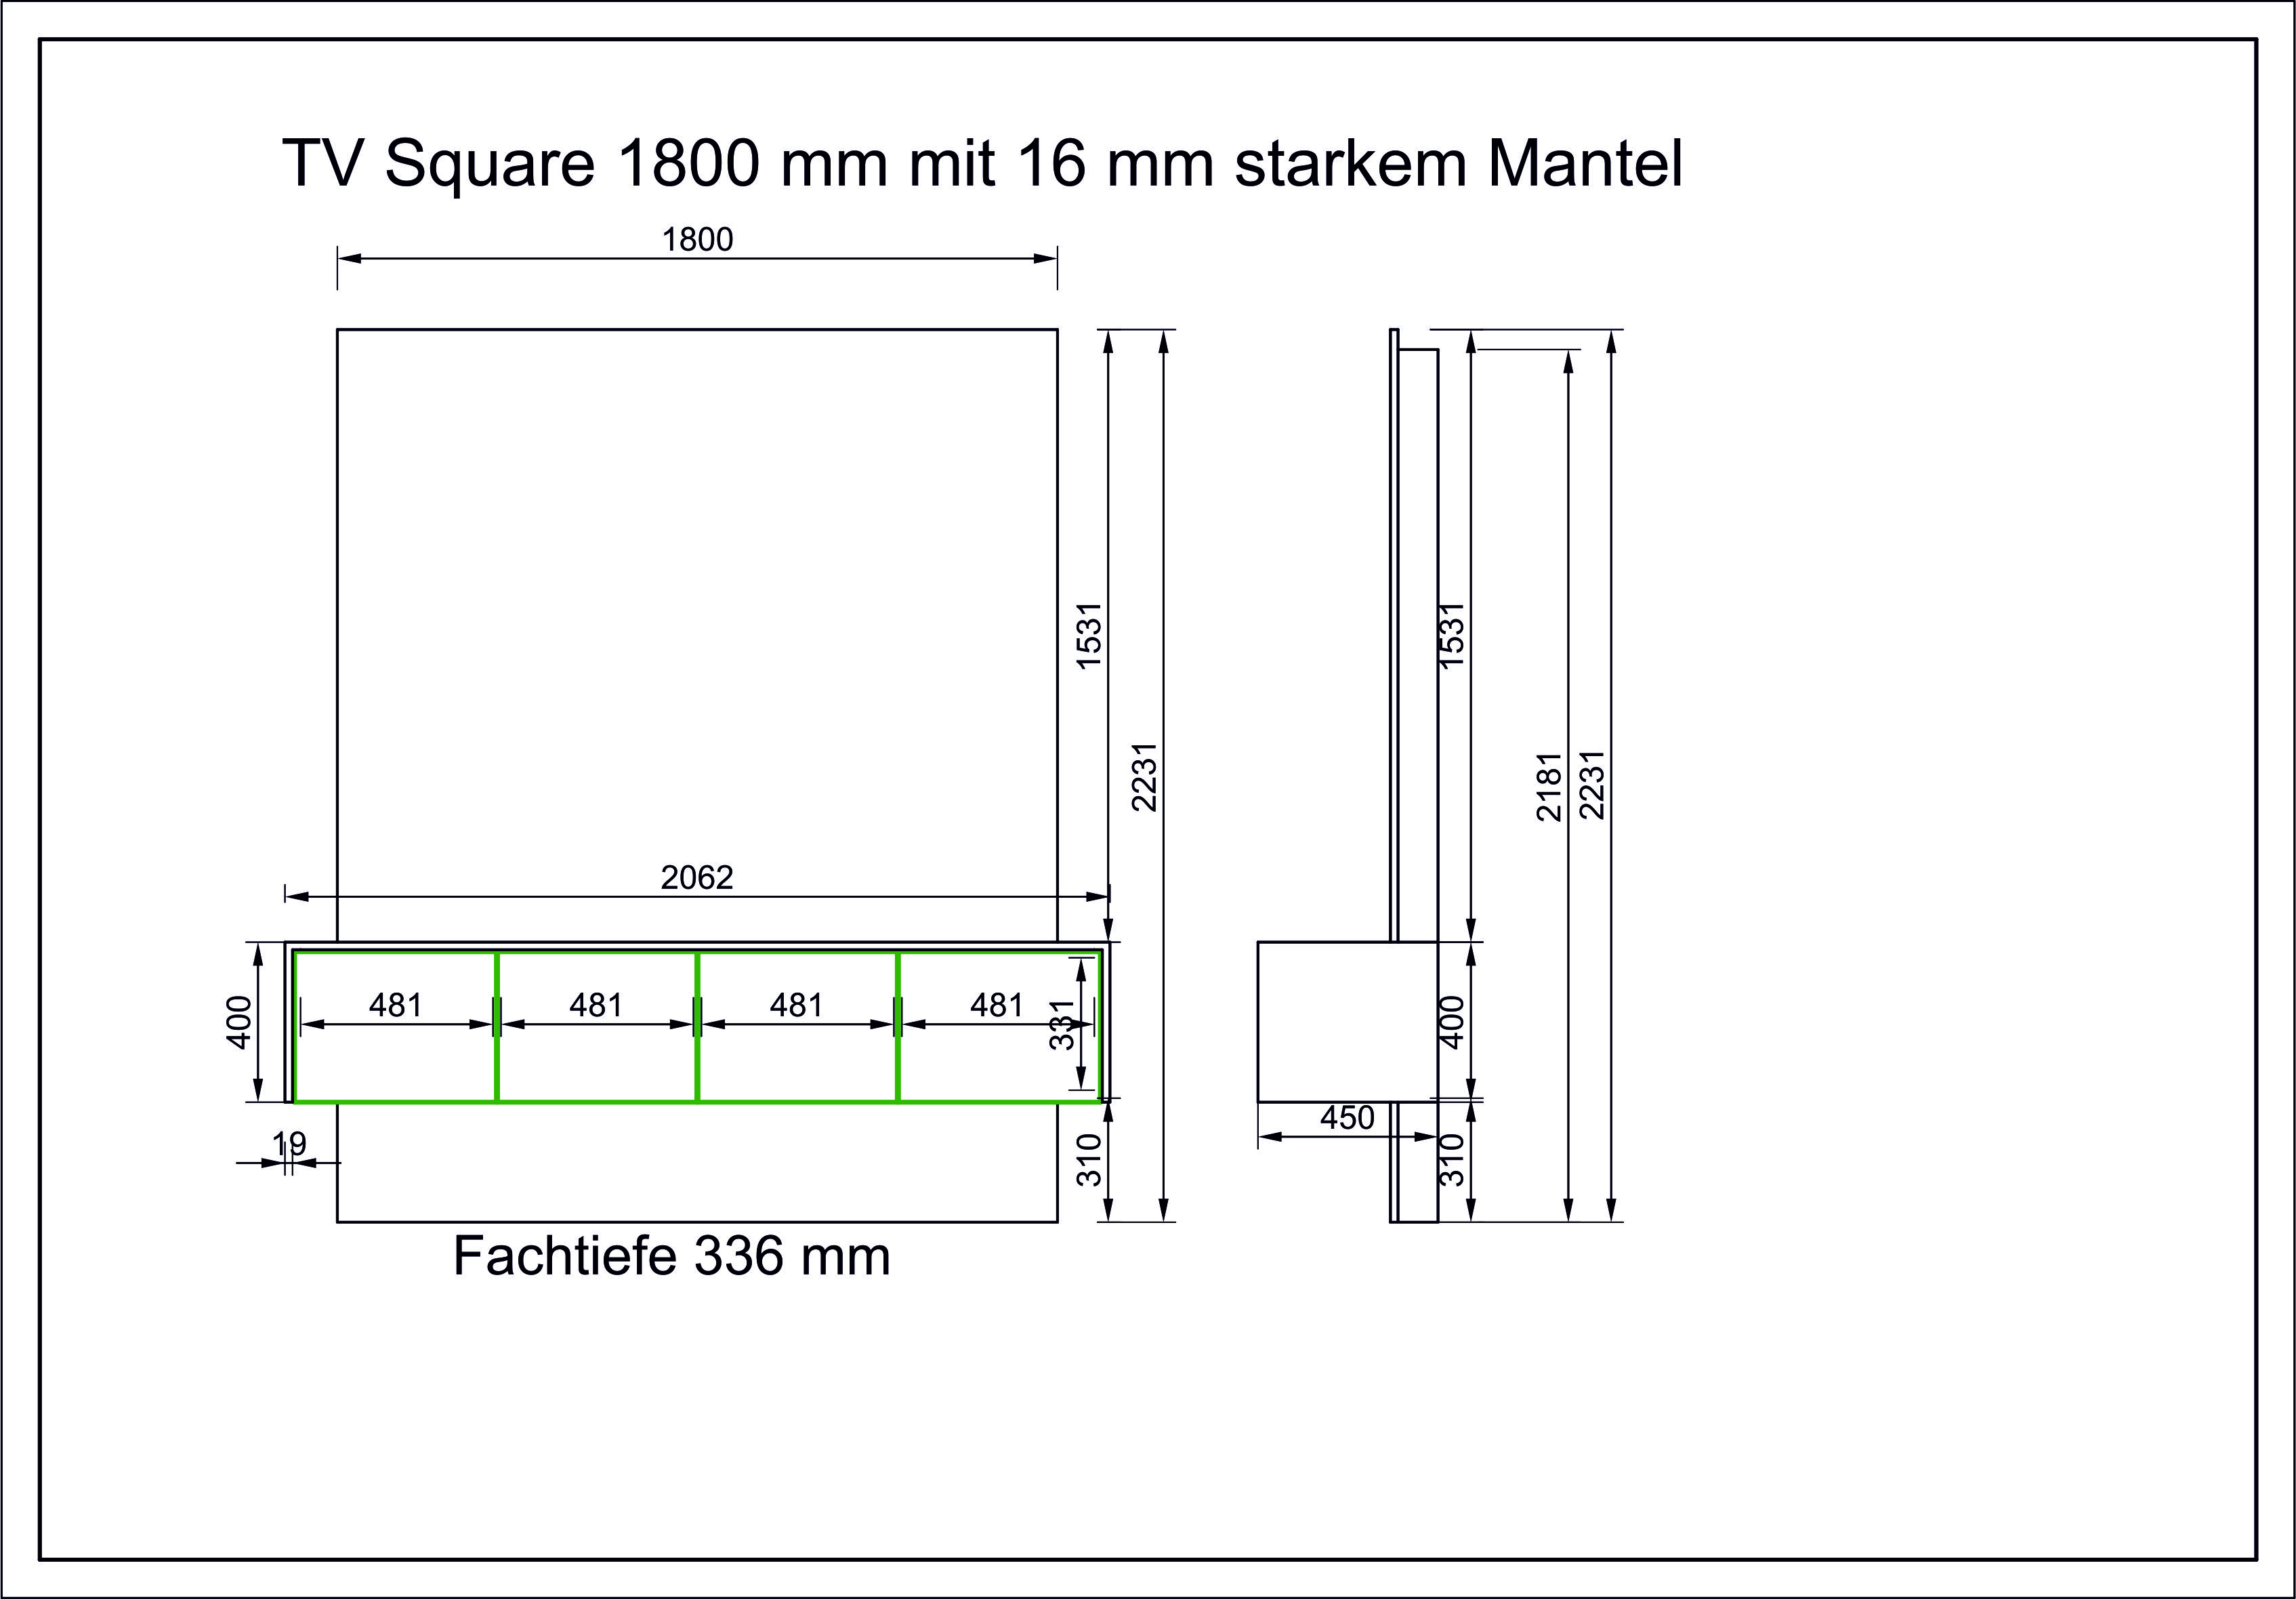 TV-Square-1800mm-mit-19mm-Mantel